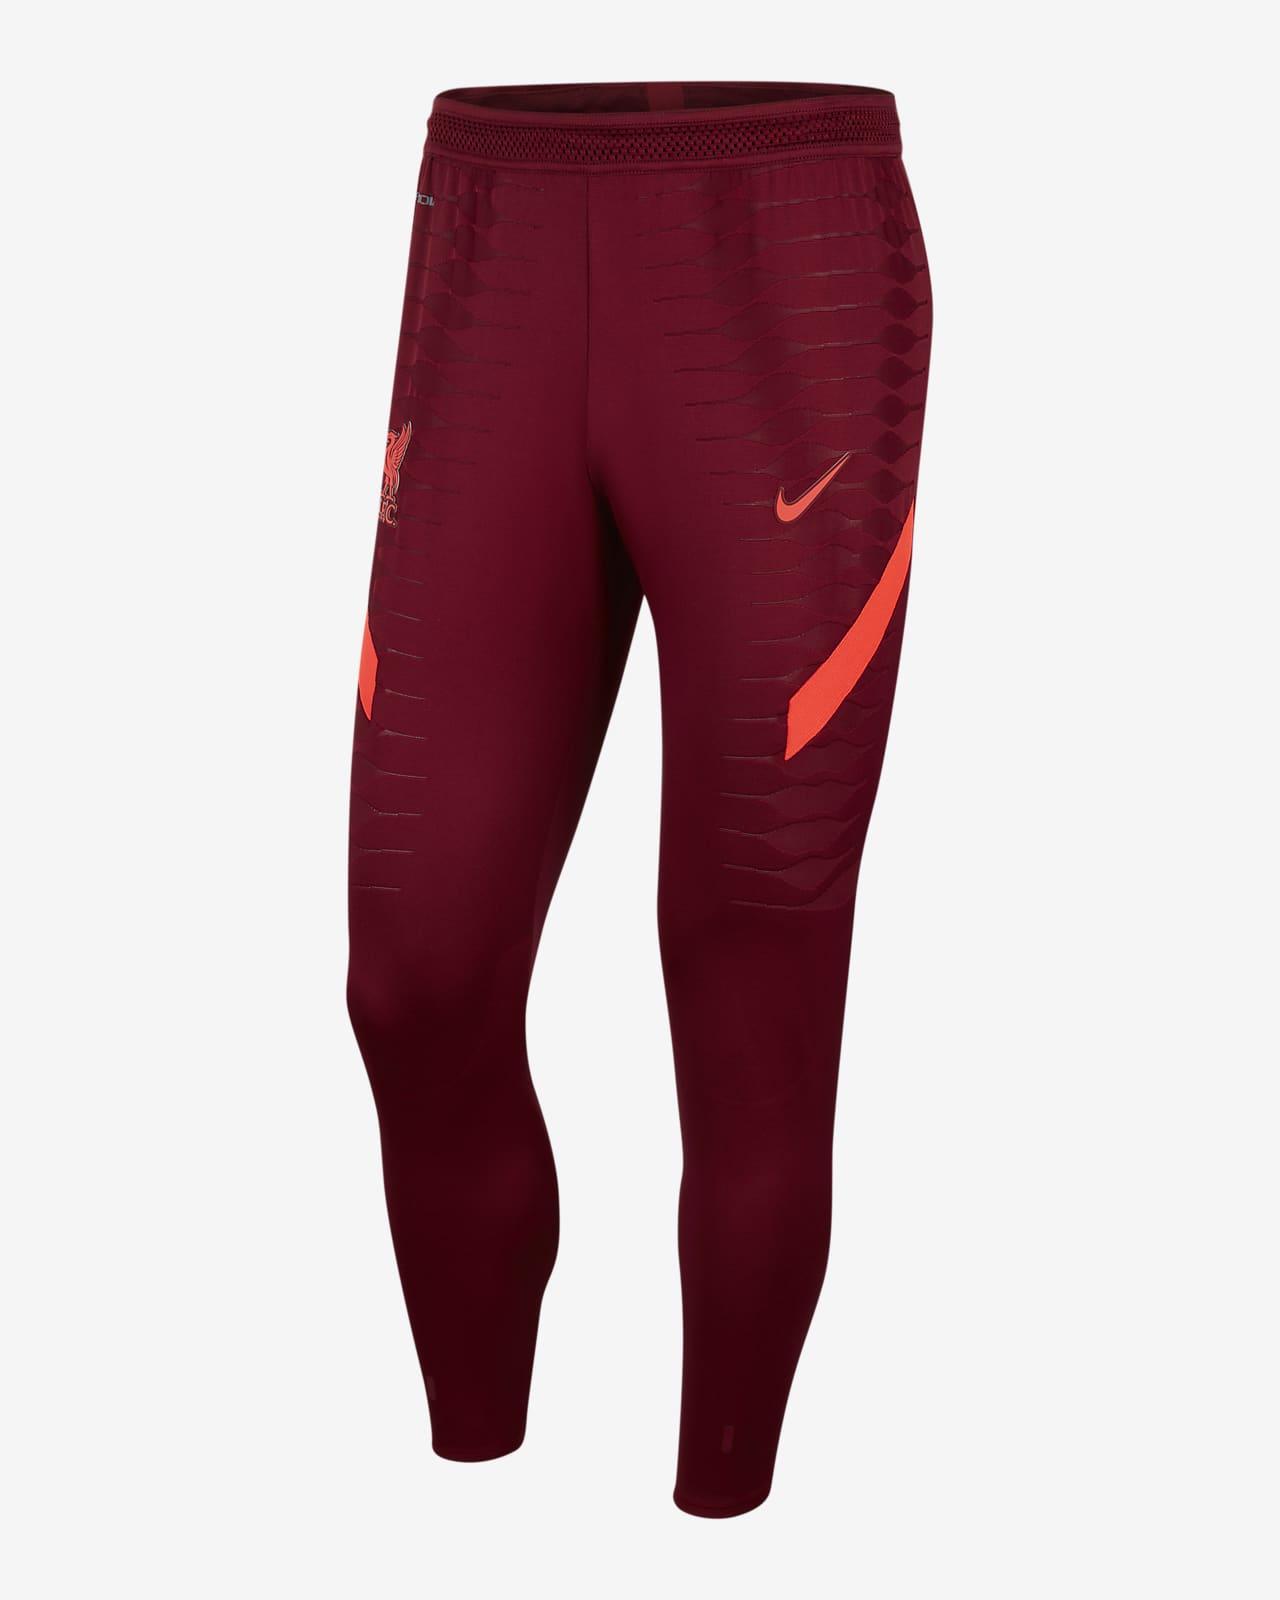 Liverpool F.C. Strike Elite Men's Nike Dri-FIT ADV Football Pants